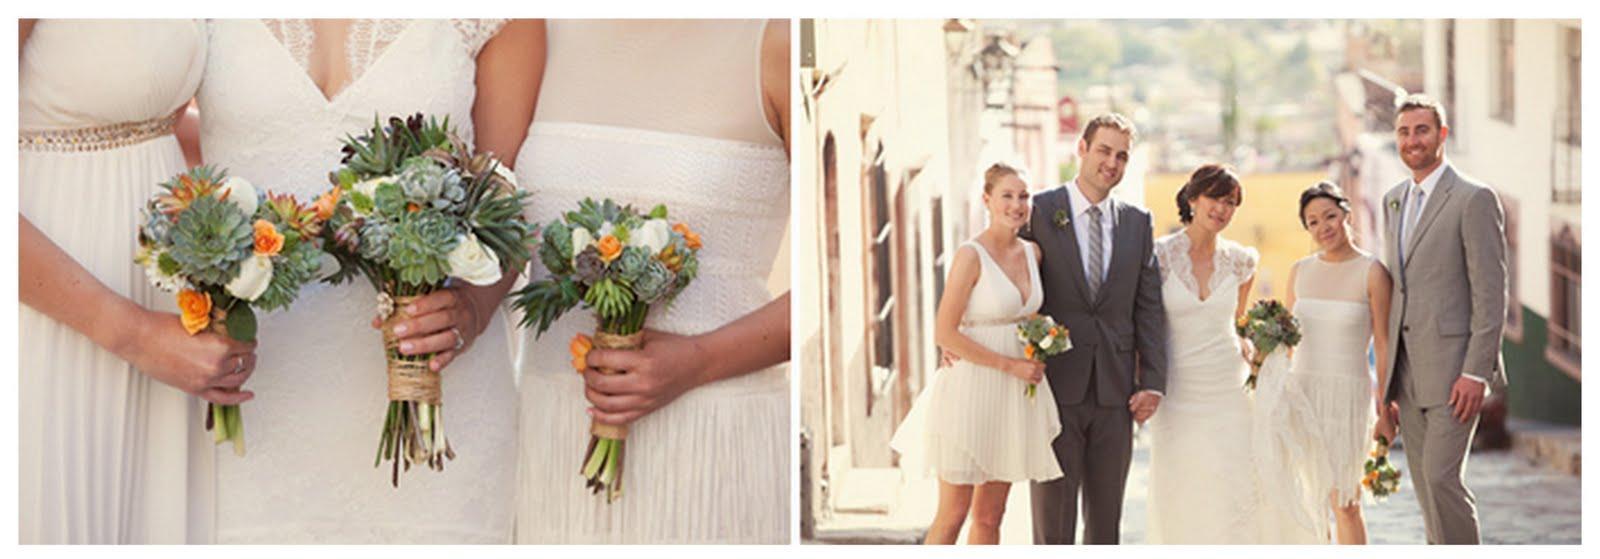 Real Destination Wedding: